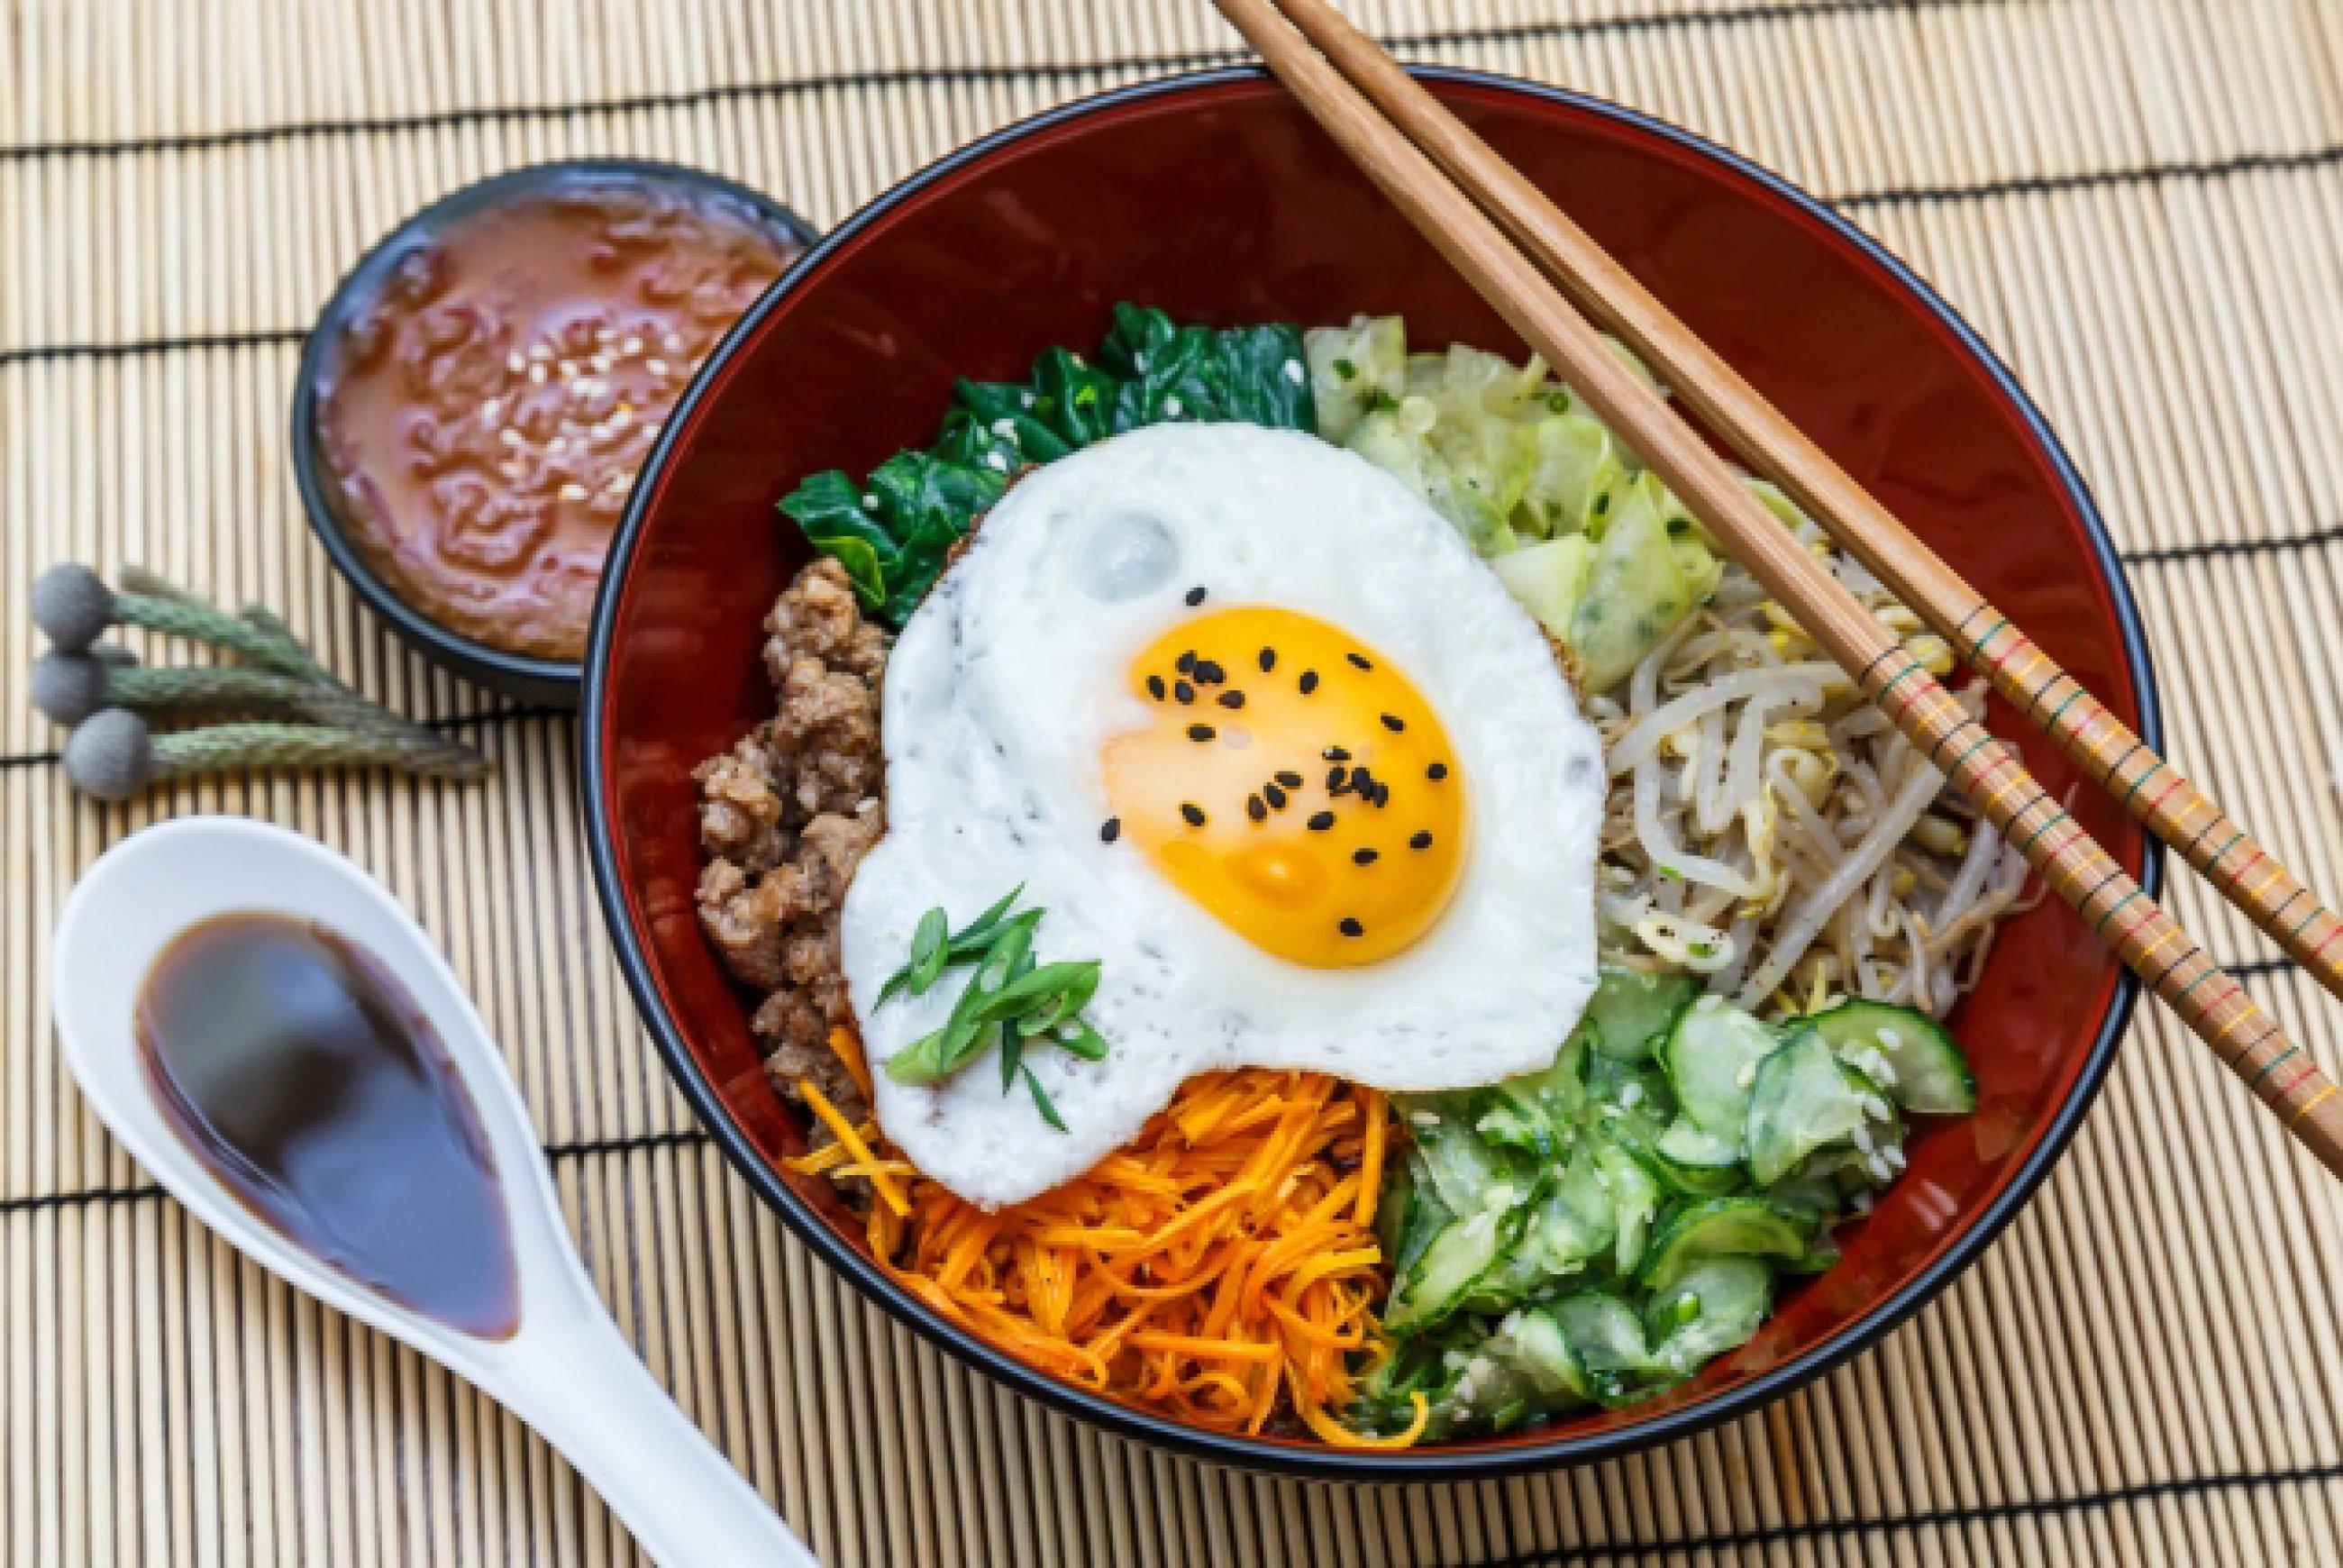 https://bubo.sk/uploads/galleries/7452/bibimbap-in-a-bowl-korean-dish-on-bamboo-mat.jpg